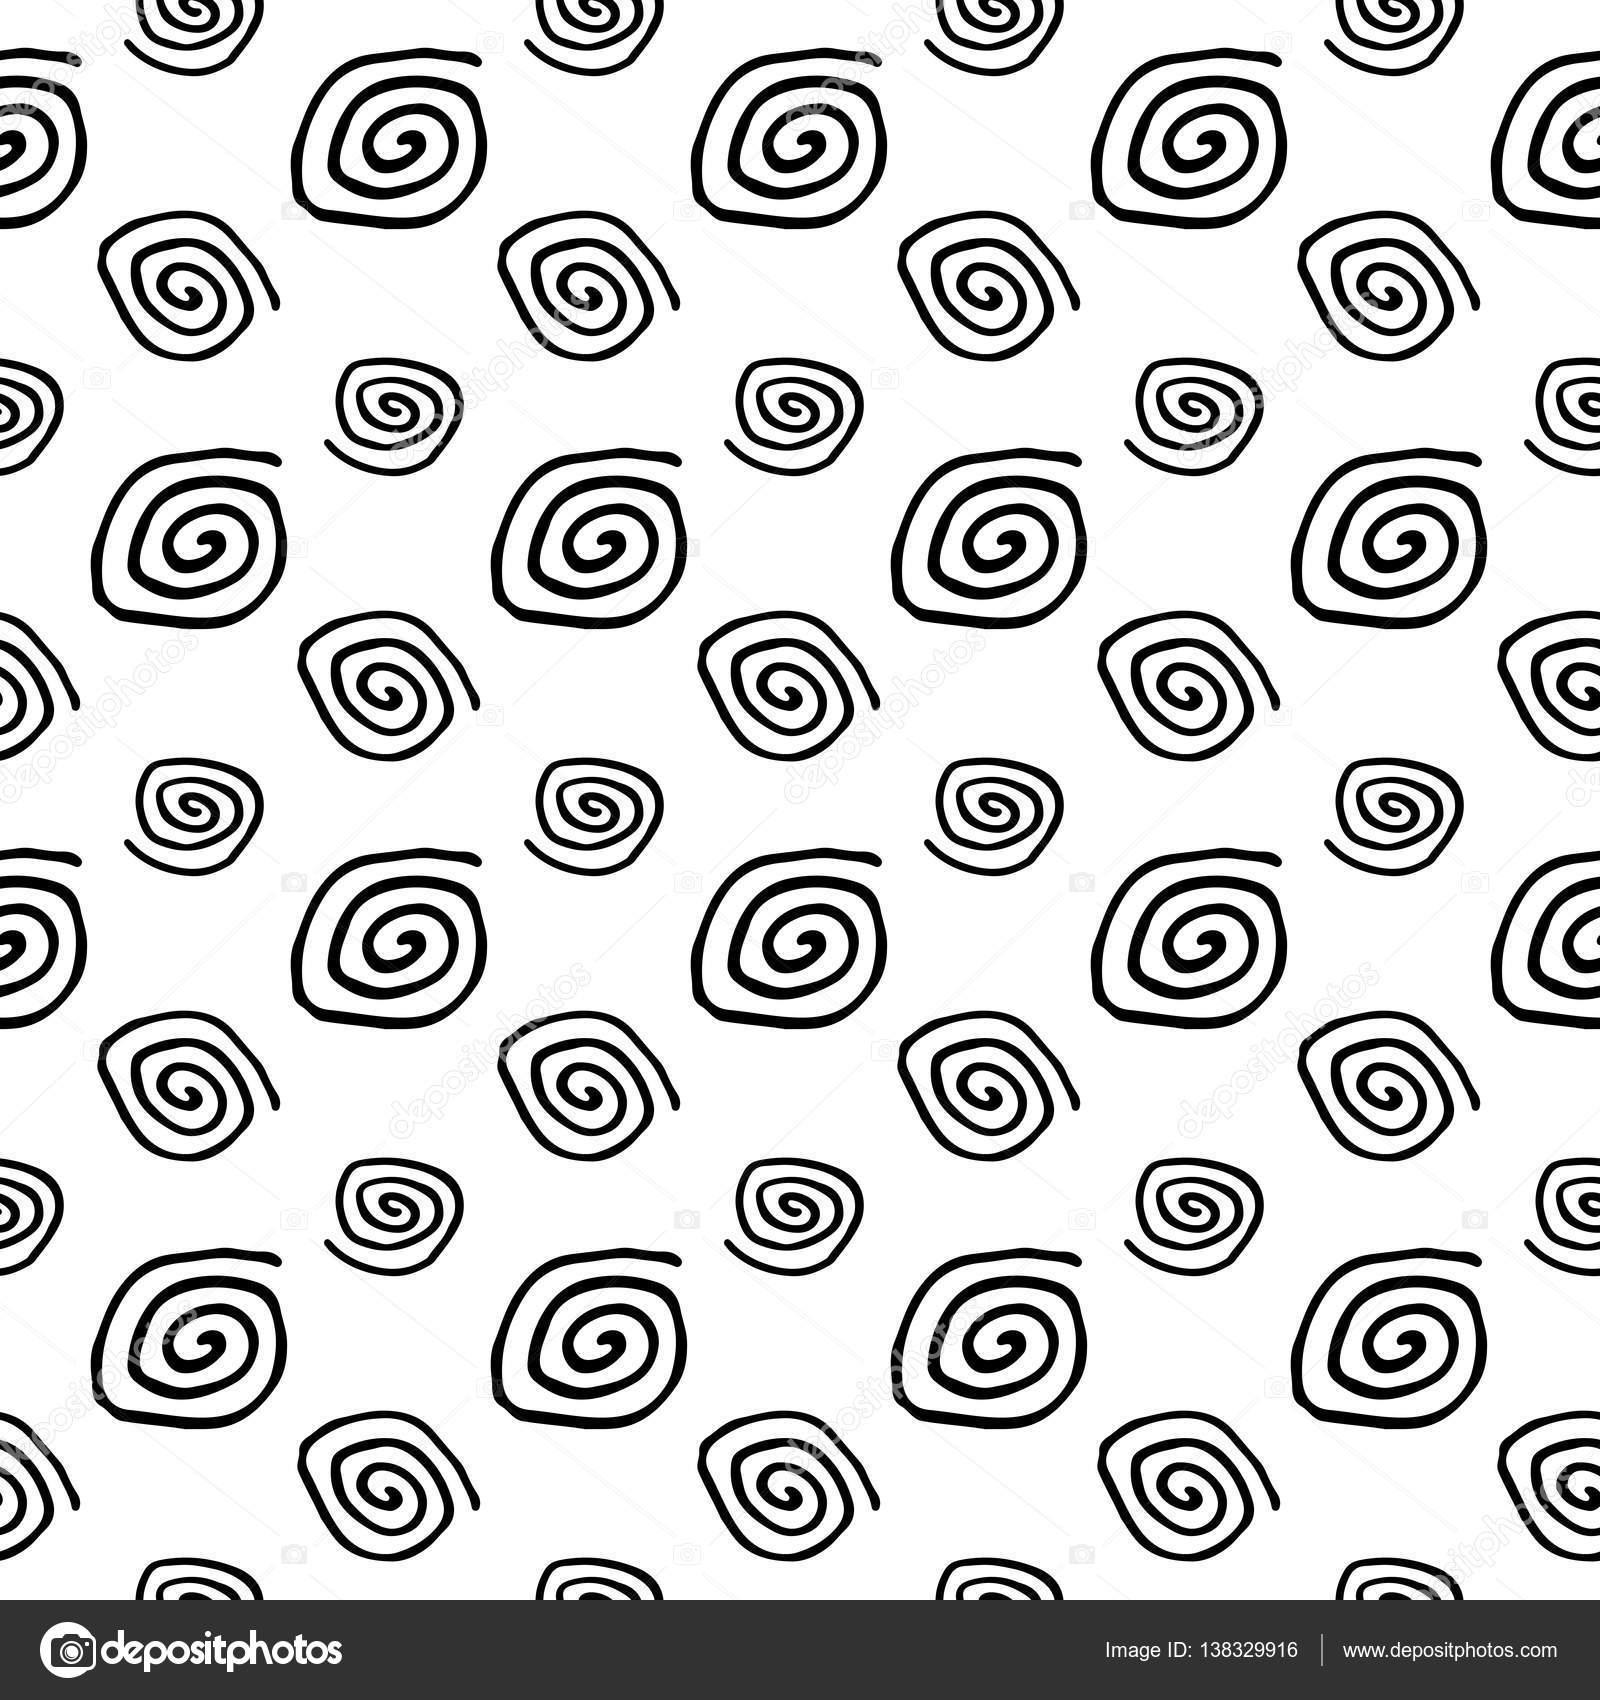 patrón sin costuras en espiral abstracto — Vector de stock © design ...